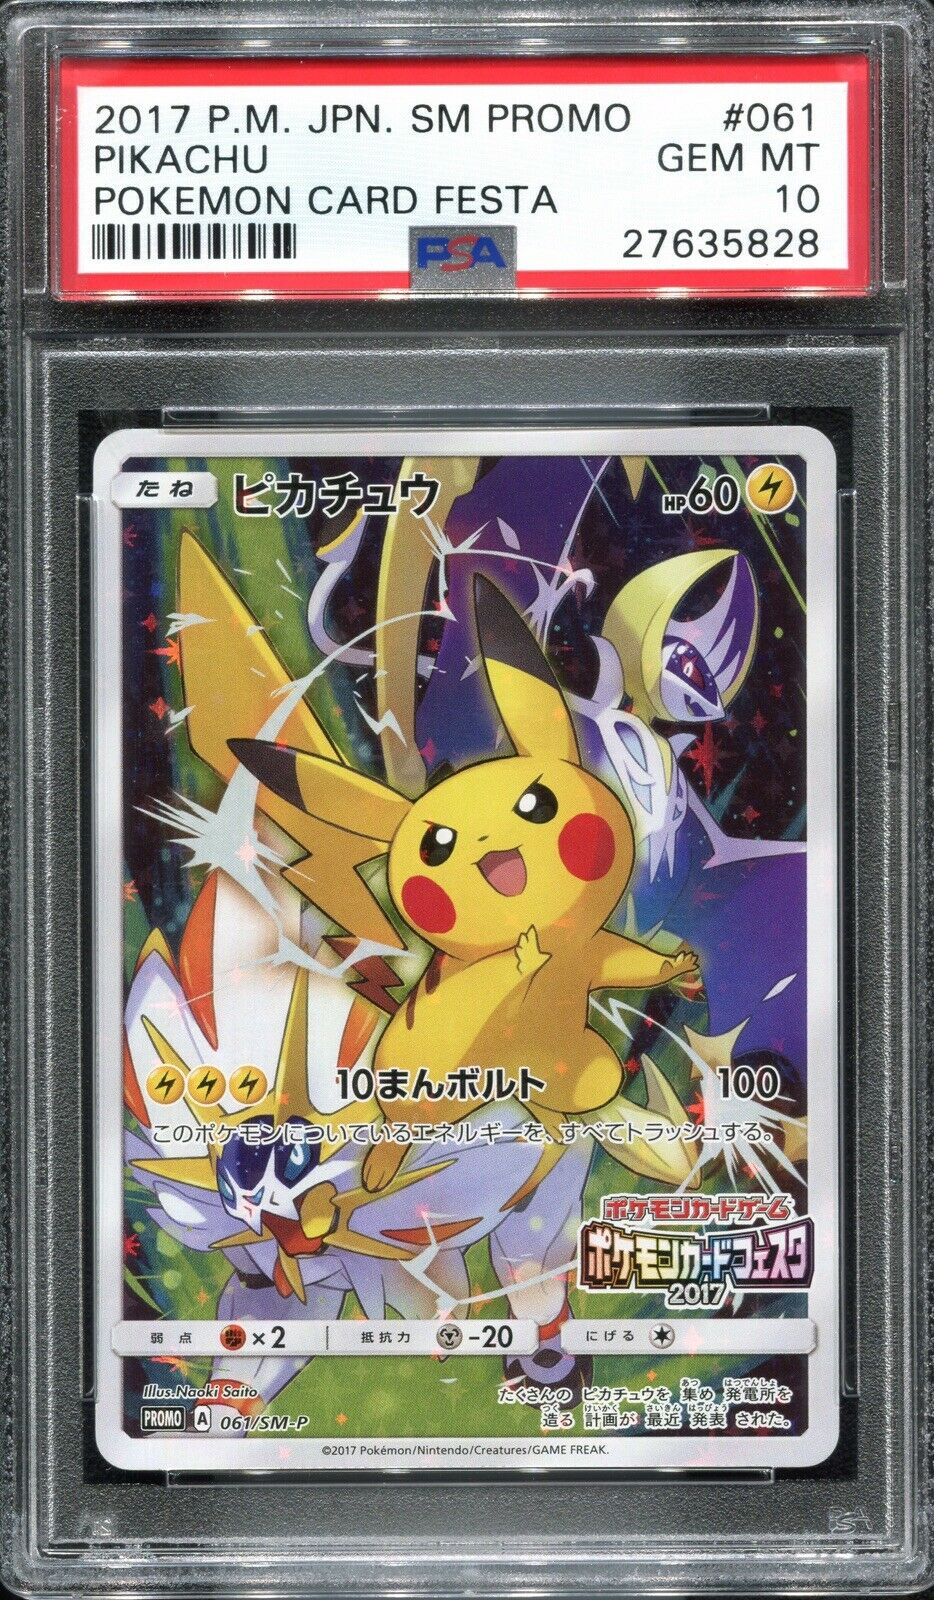 PSA 10 Pokemon Japanese SM Promo Card 2017 Festa Pikachu Lunala Solgaleo